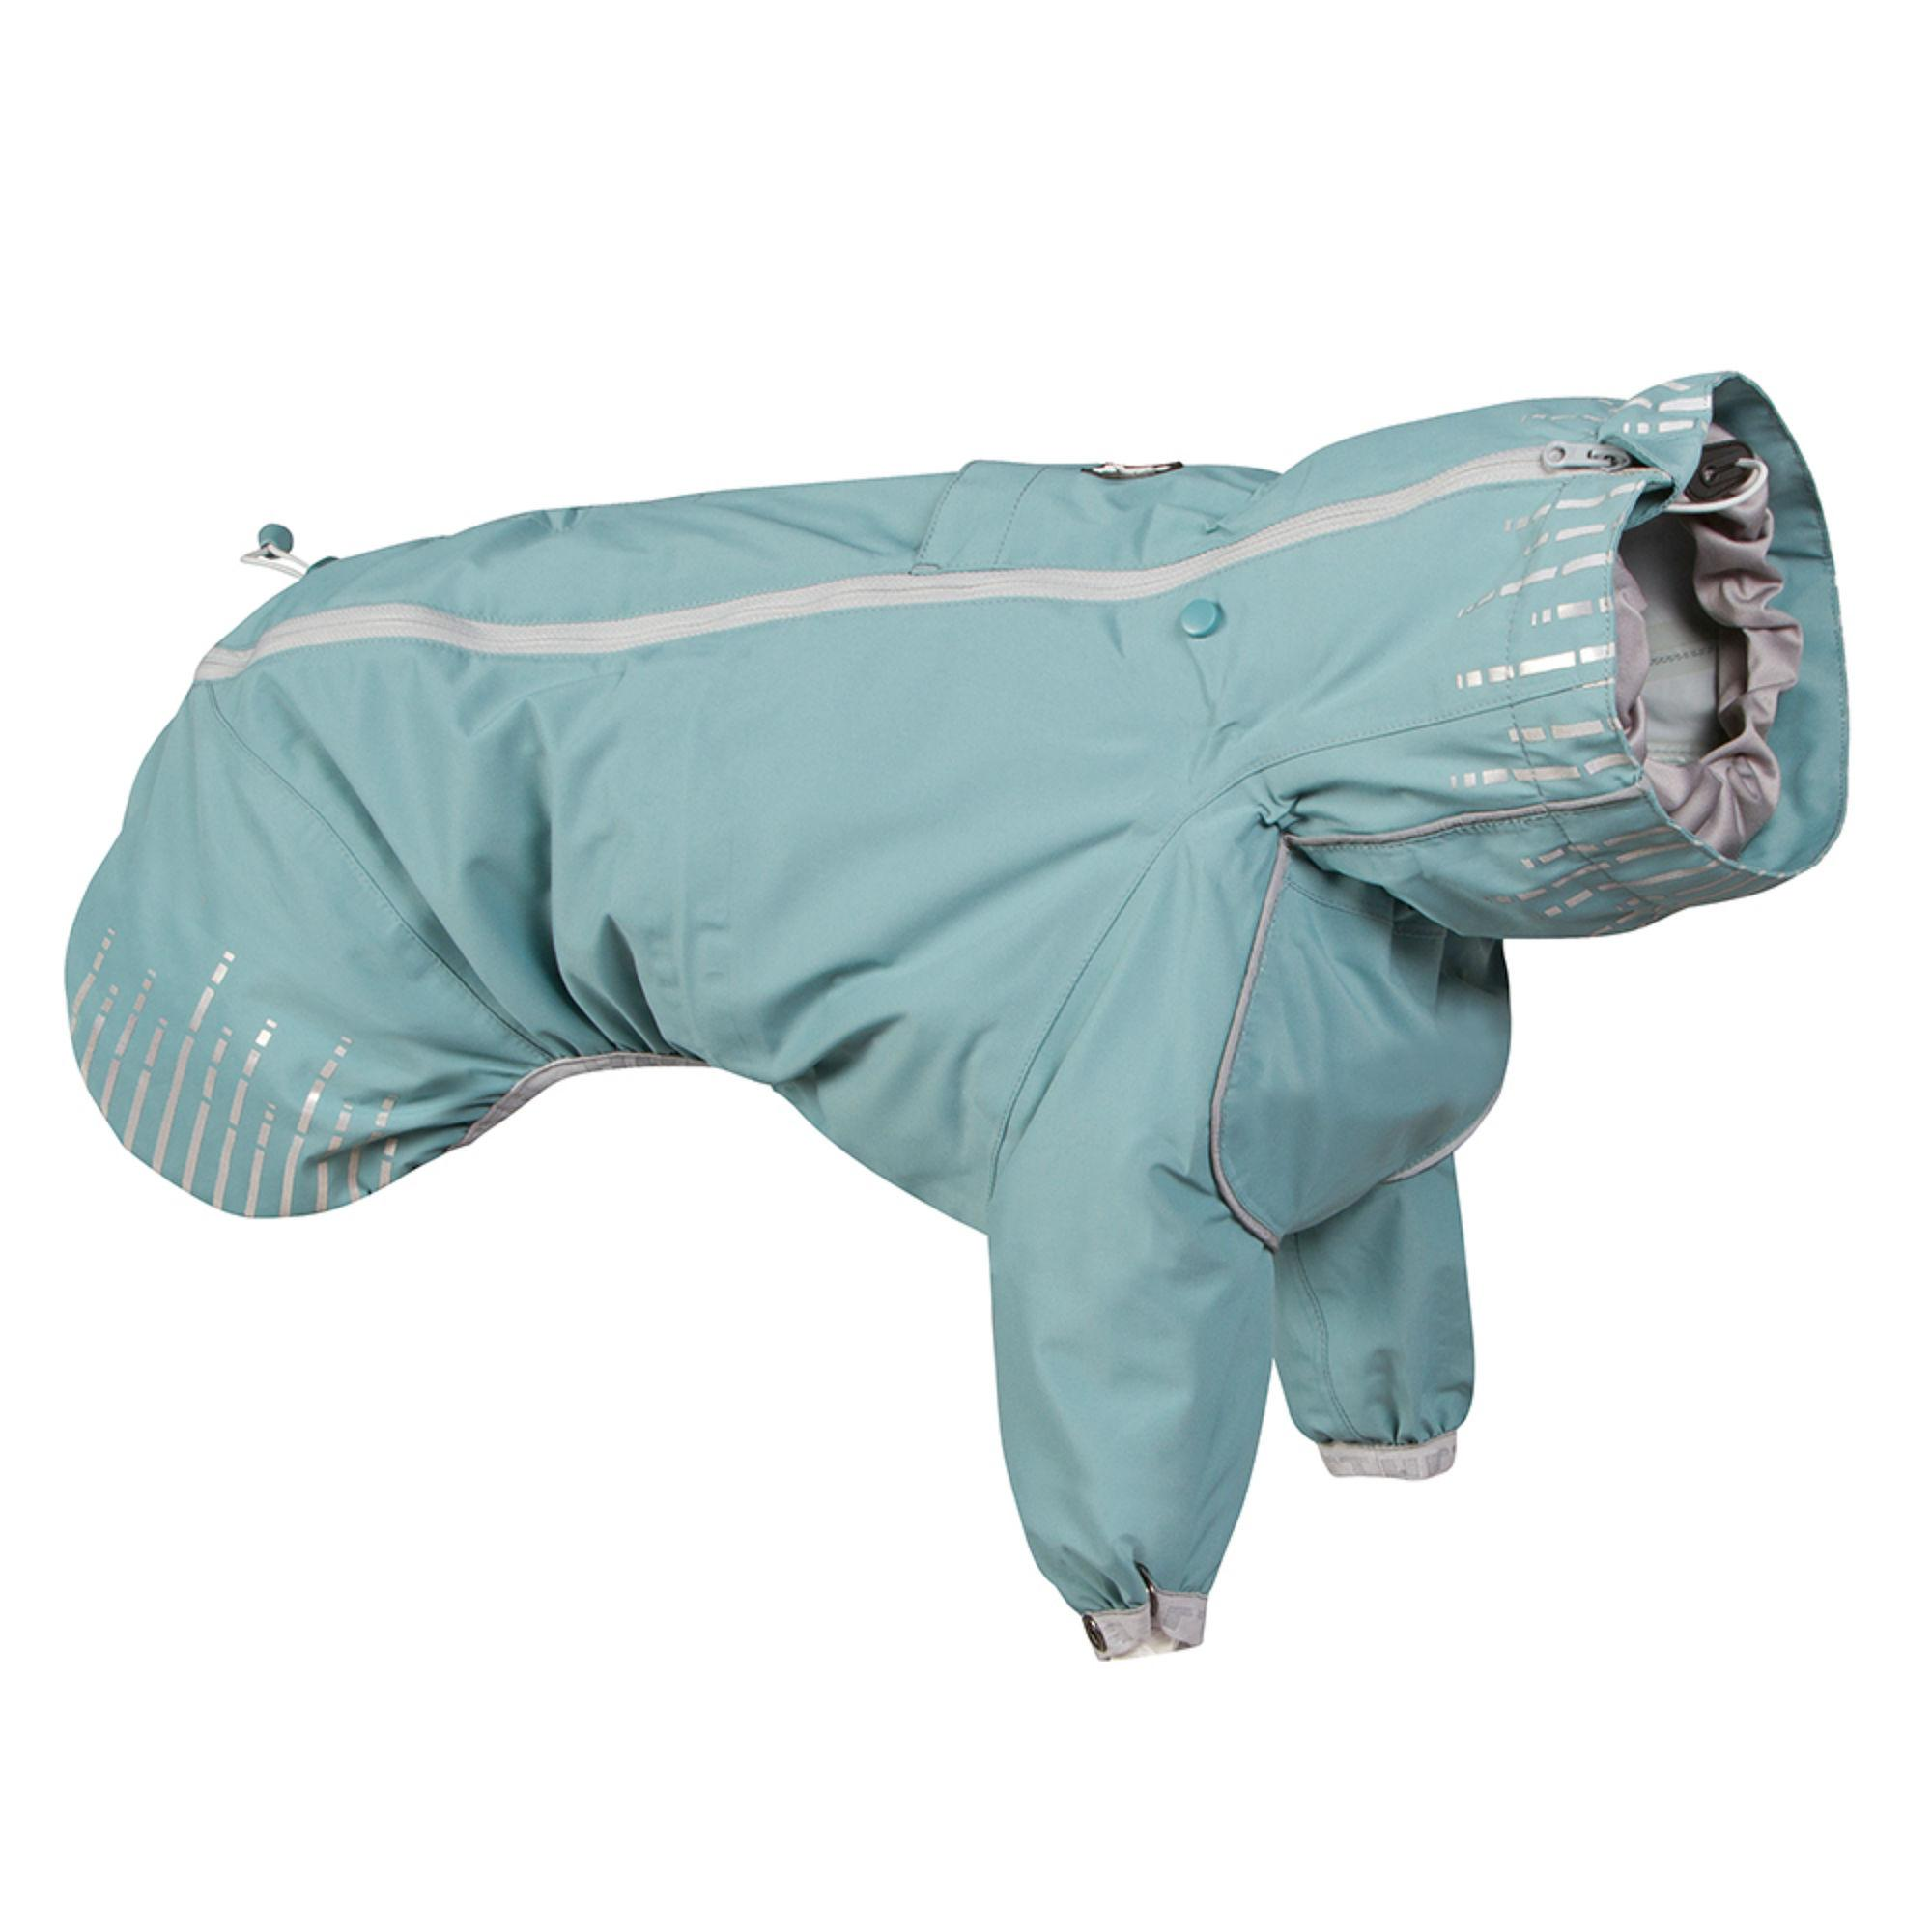 Hurtta Rain Blocker Dog Coat - Stream